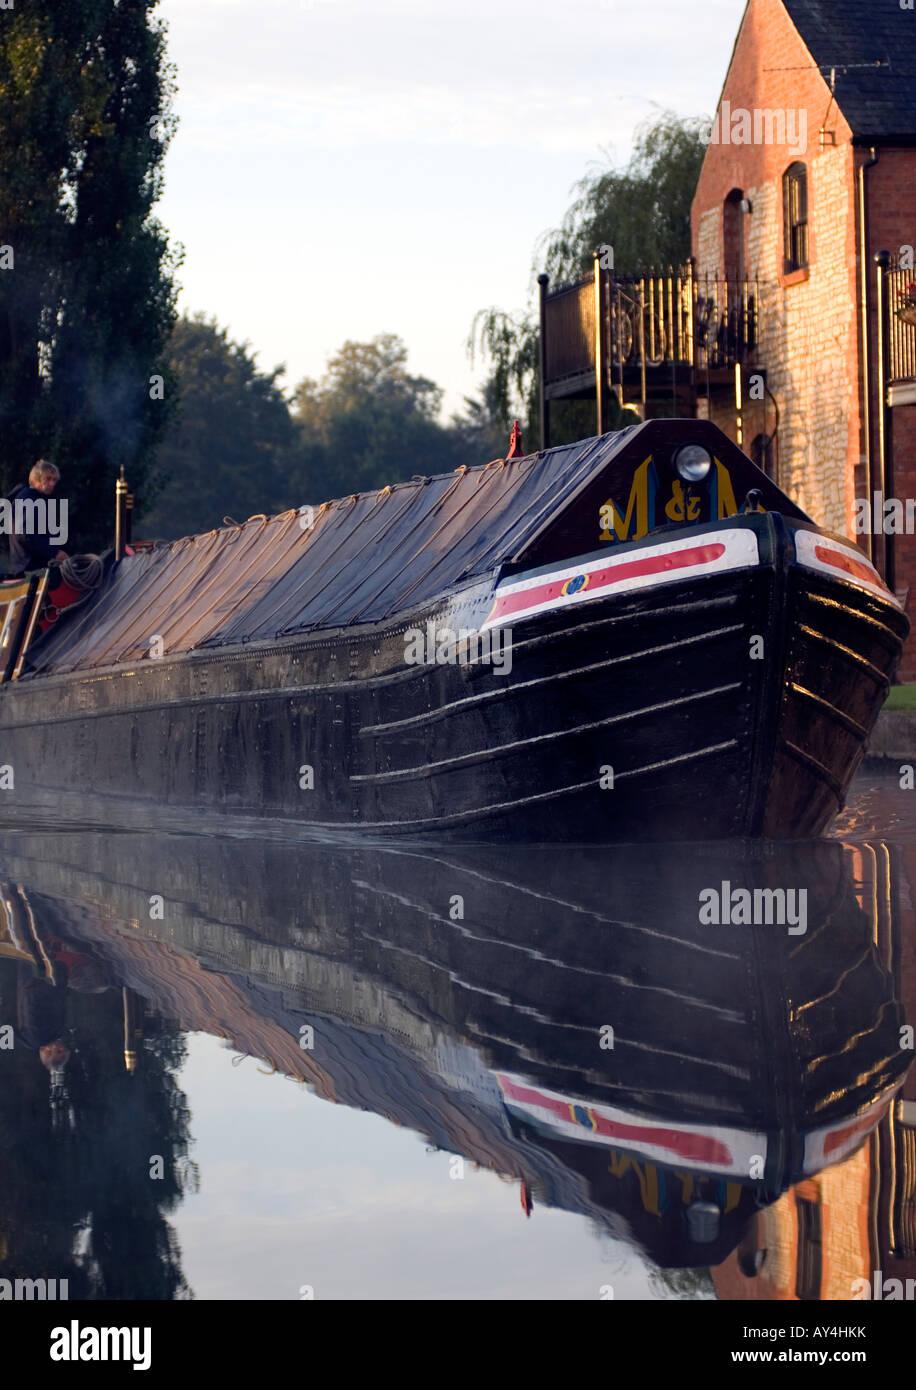 Doug Blane Traditional historic narrowboat navigating at Cosgrove on the Gran Union canal - Stock Image